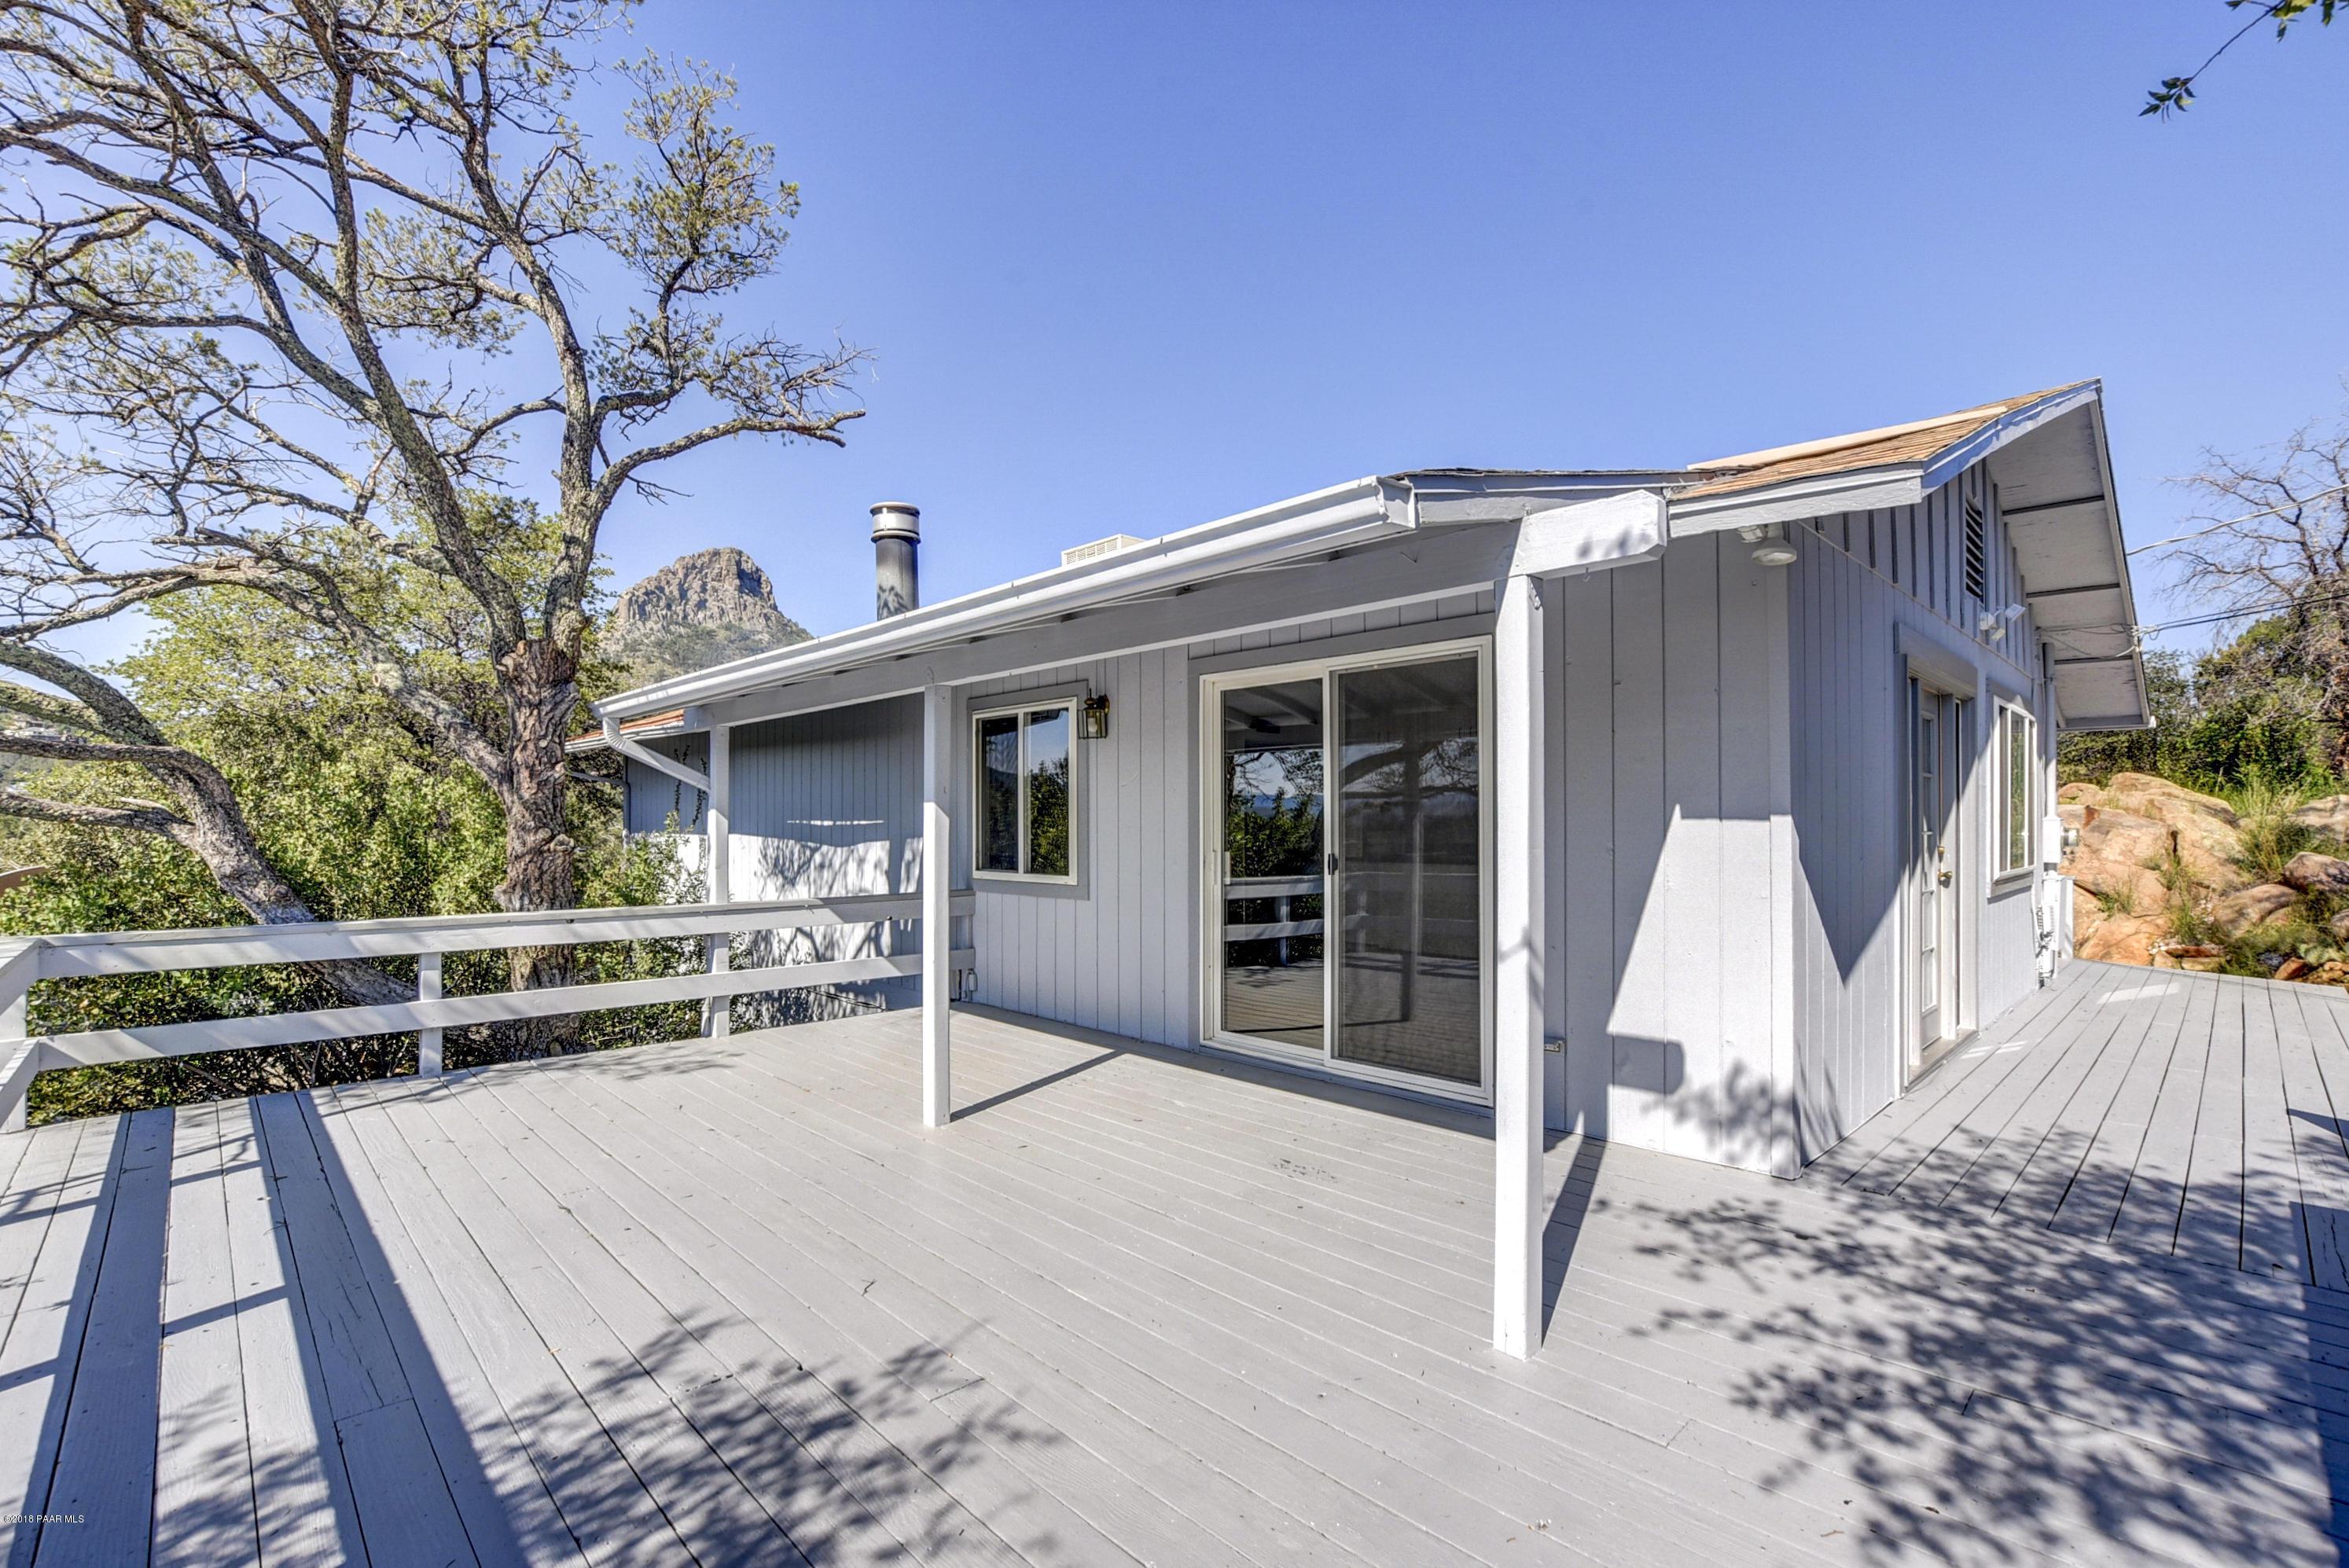 2148 W Pine Drive Prescott, AZ 86305 - MLS #: 1014847